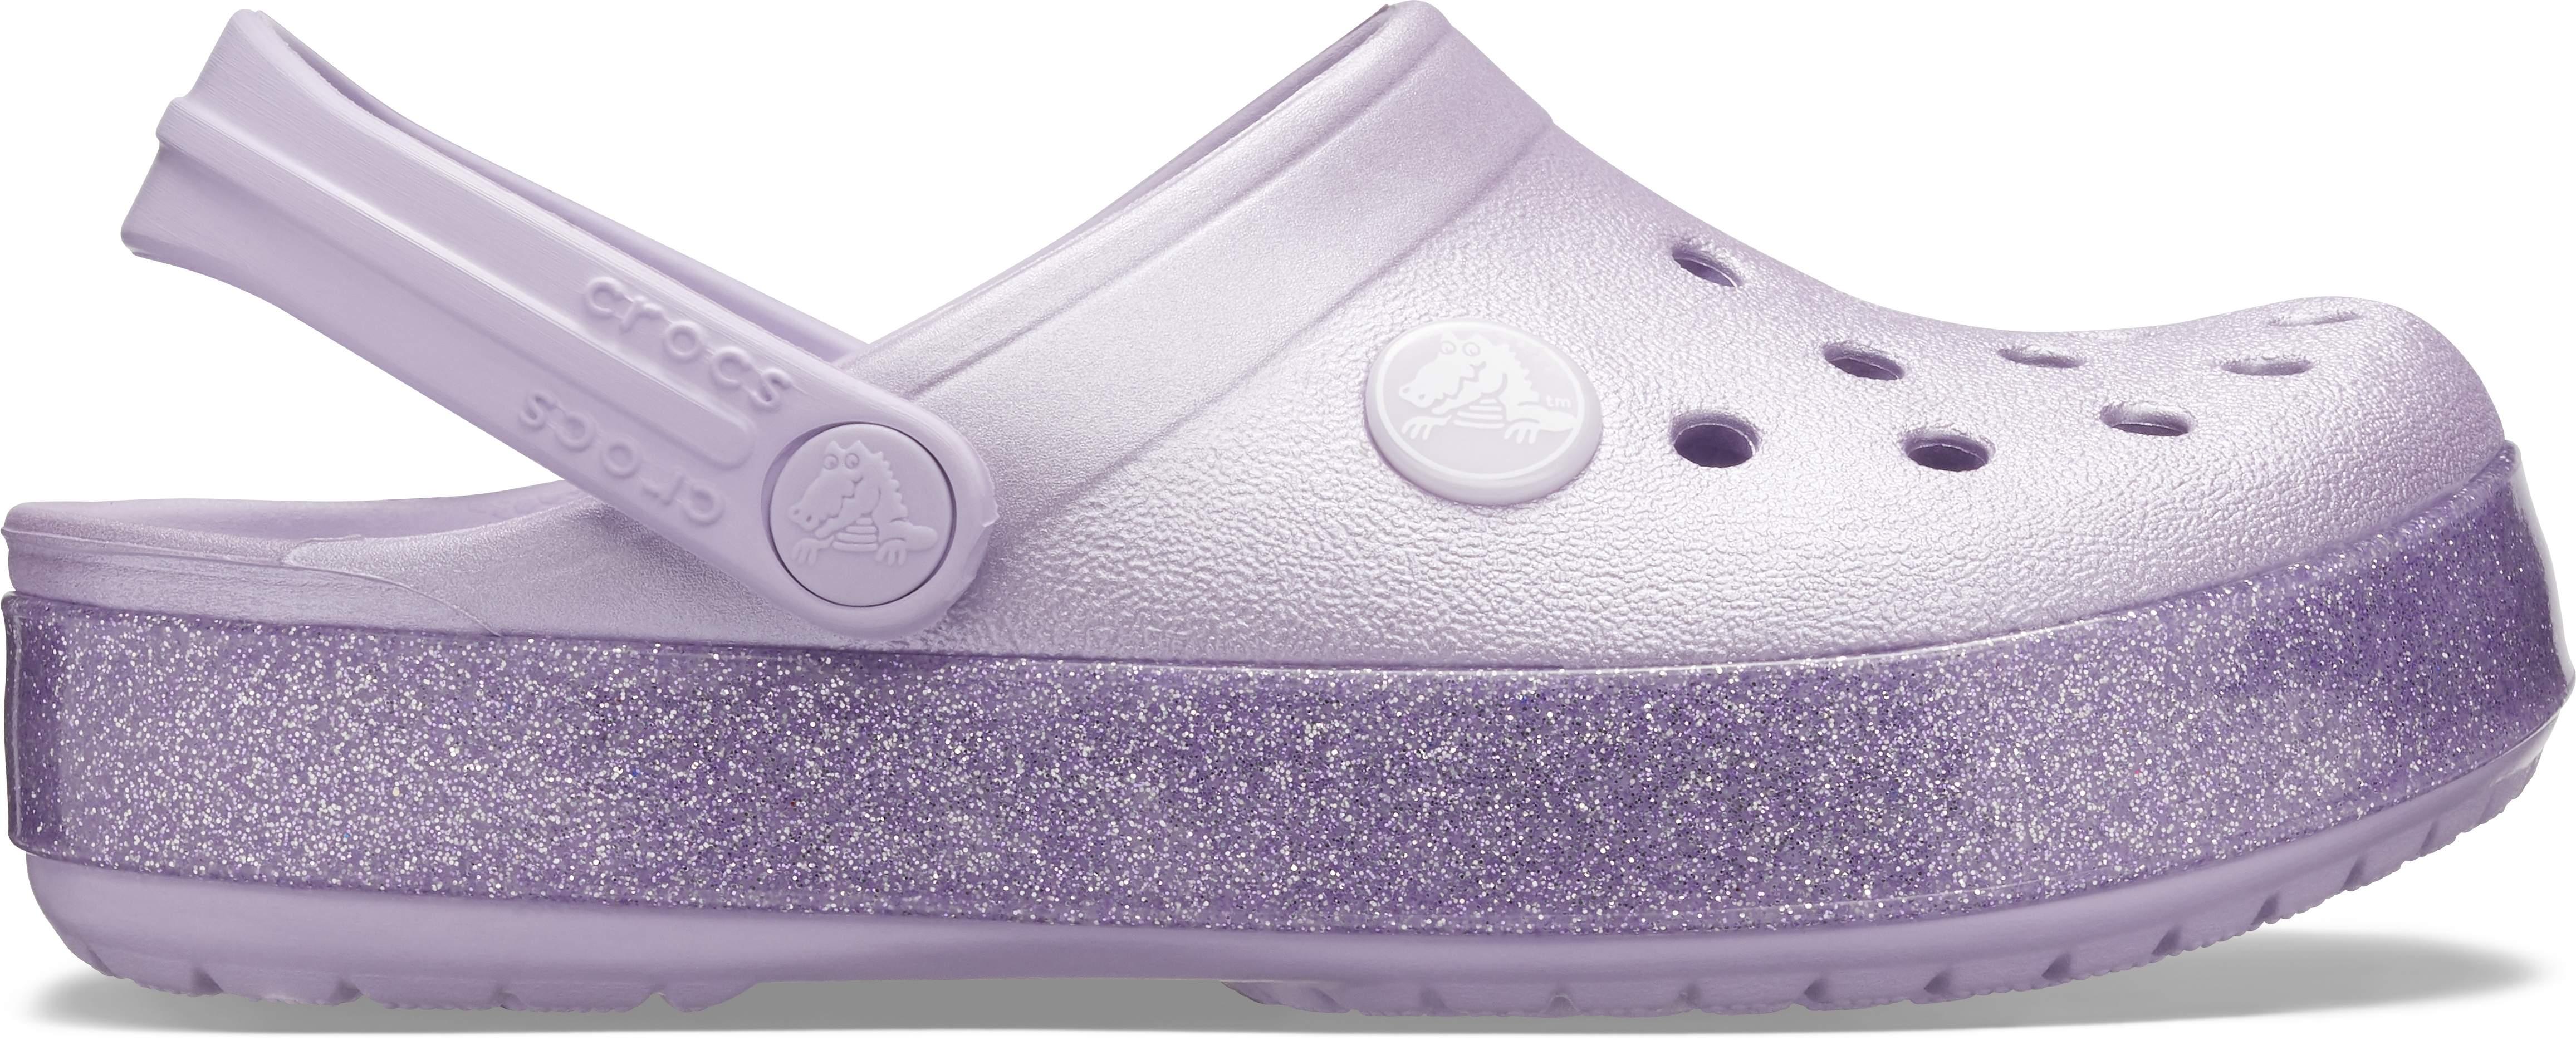 crocs Clog mit Fersenriemen Crocband Glitter Clog Kids Silber Croslite Normal Ki